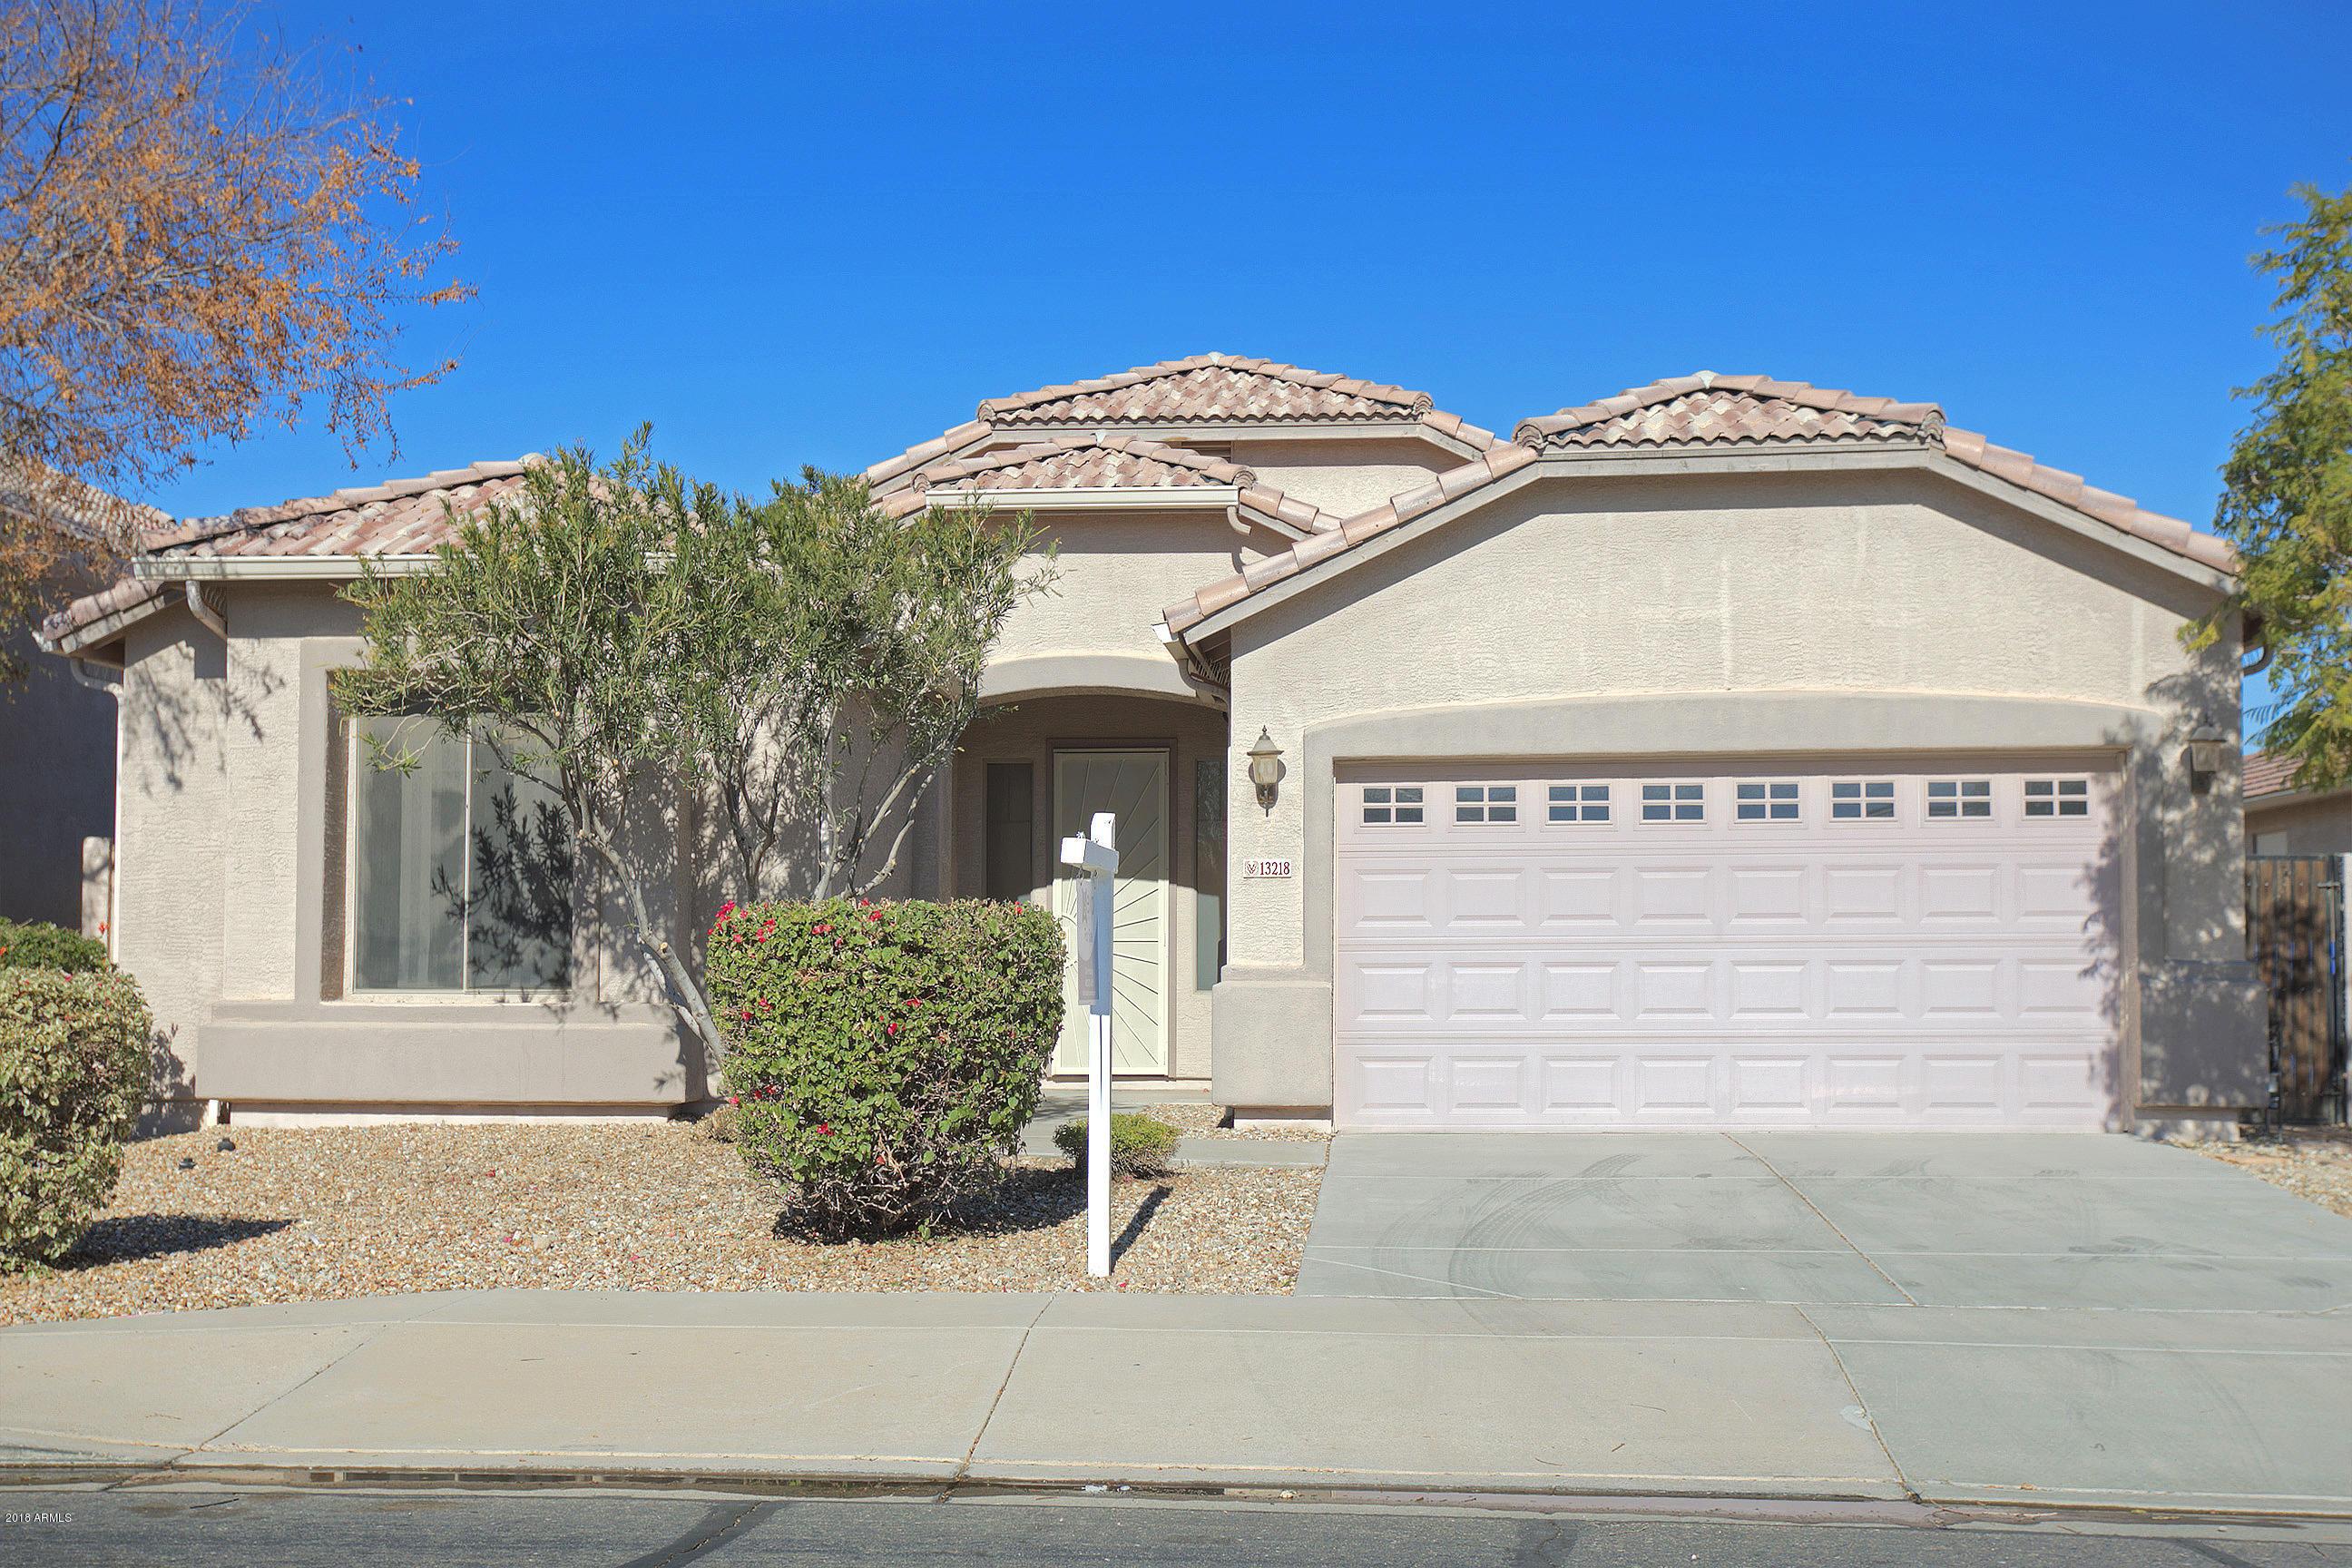 Photo of 13218 W CITRUS Way, Litchfield Park, AZ 85340